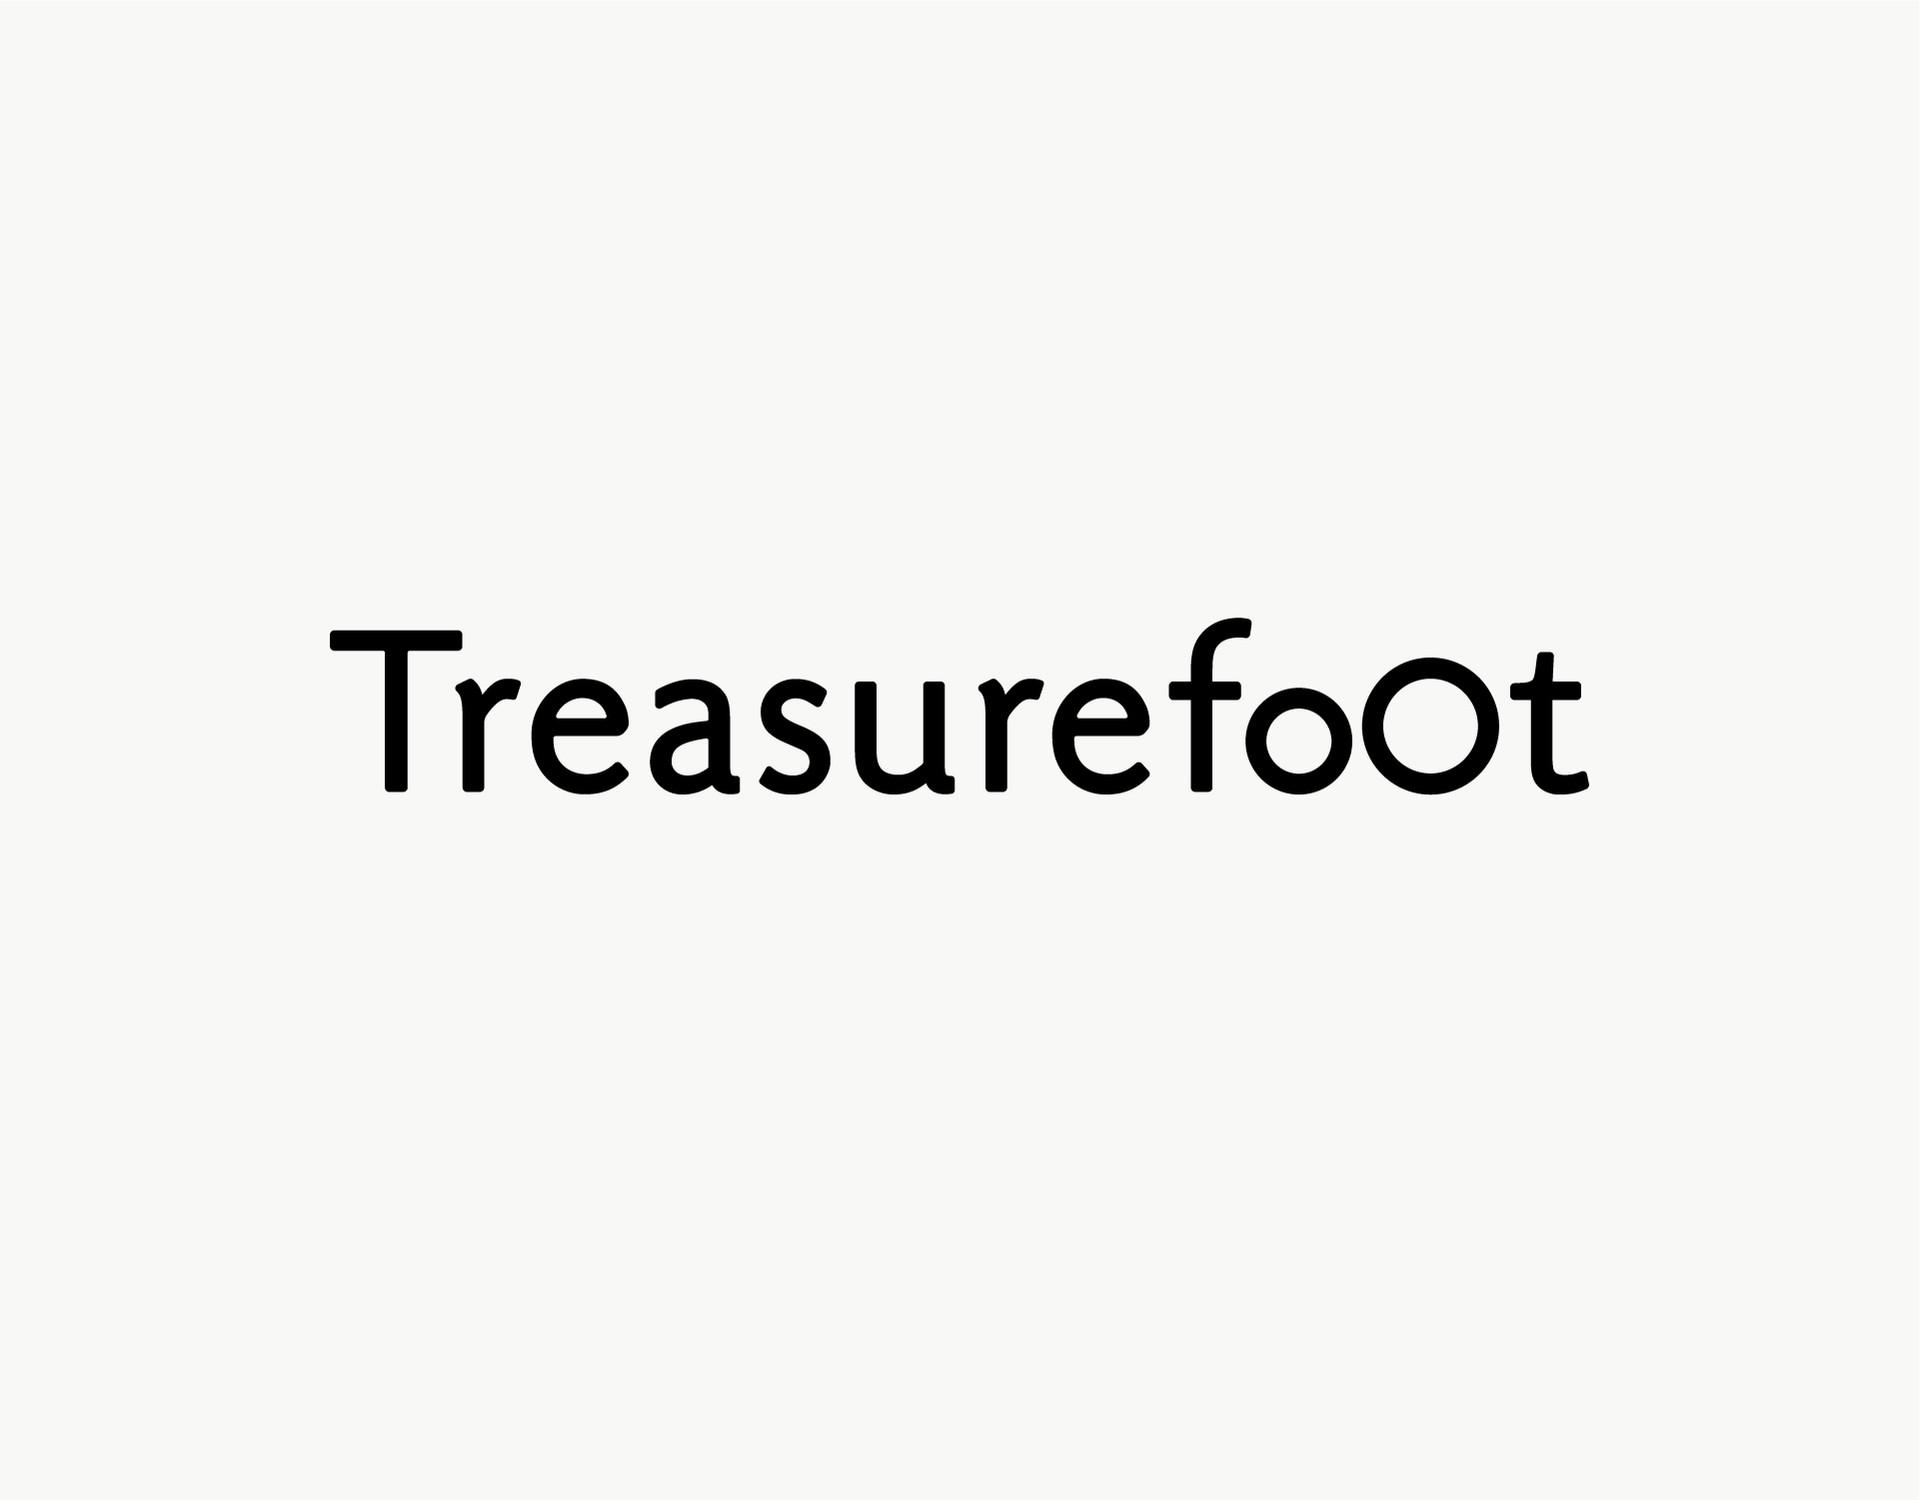 trasurefoot_01_アートボード 1.jpg